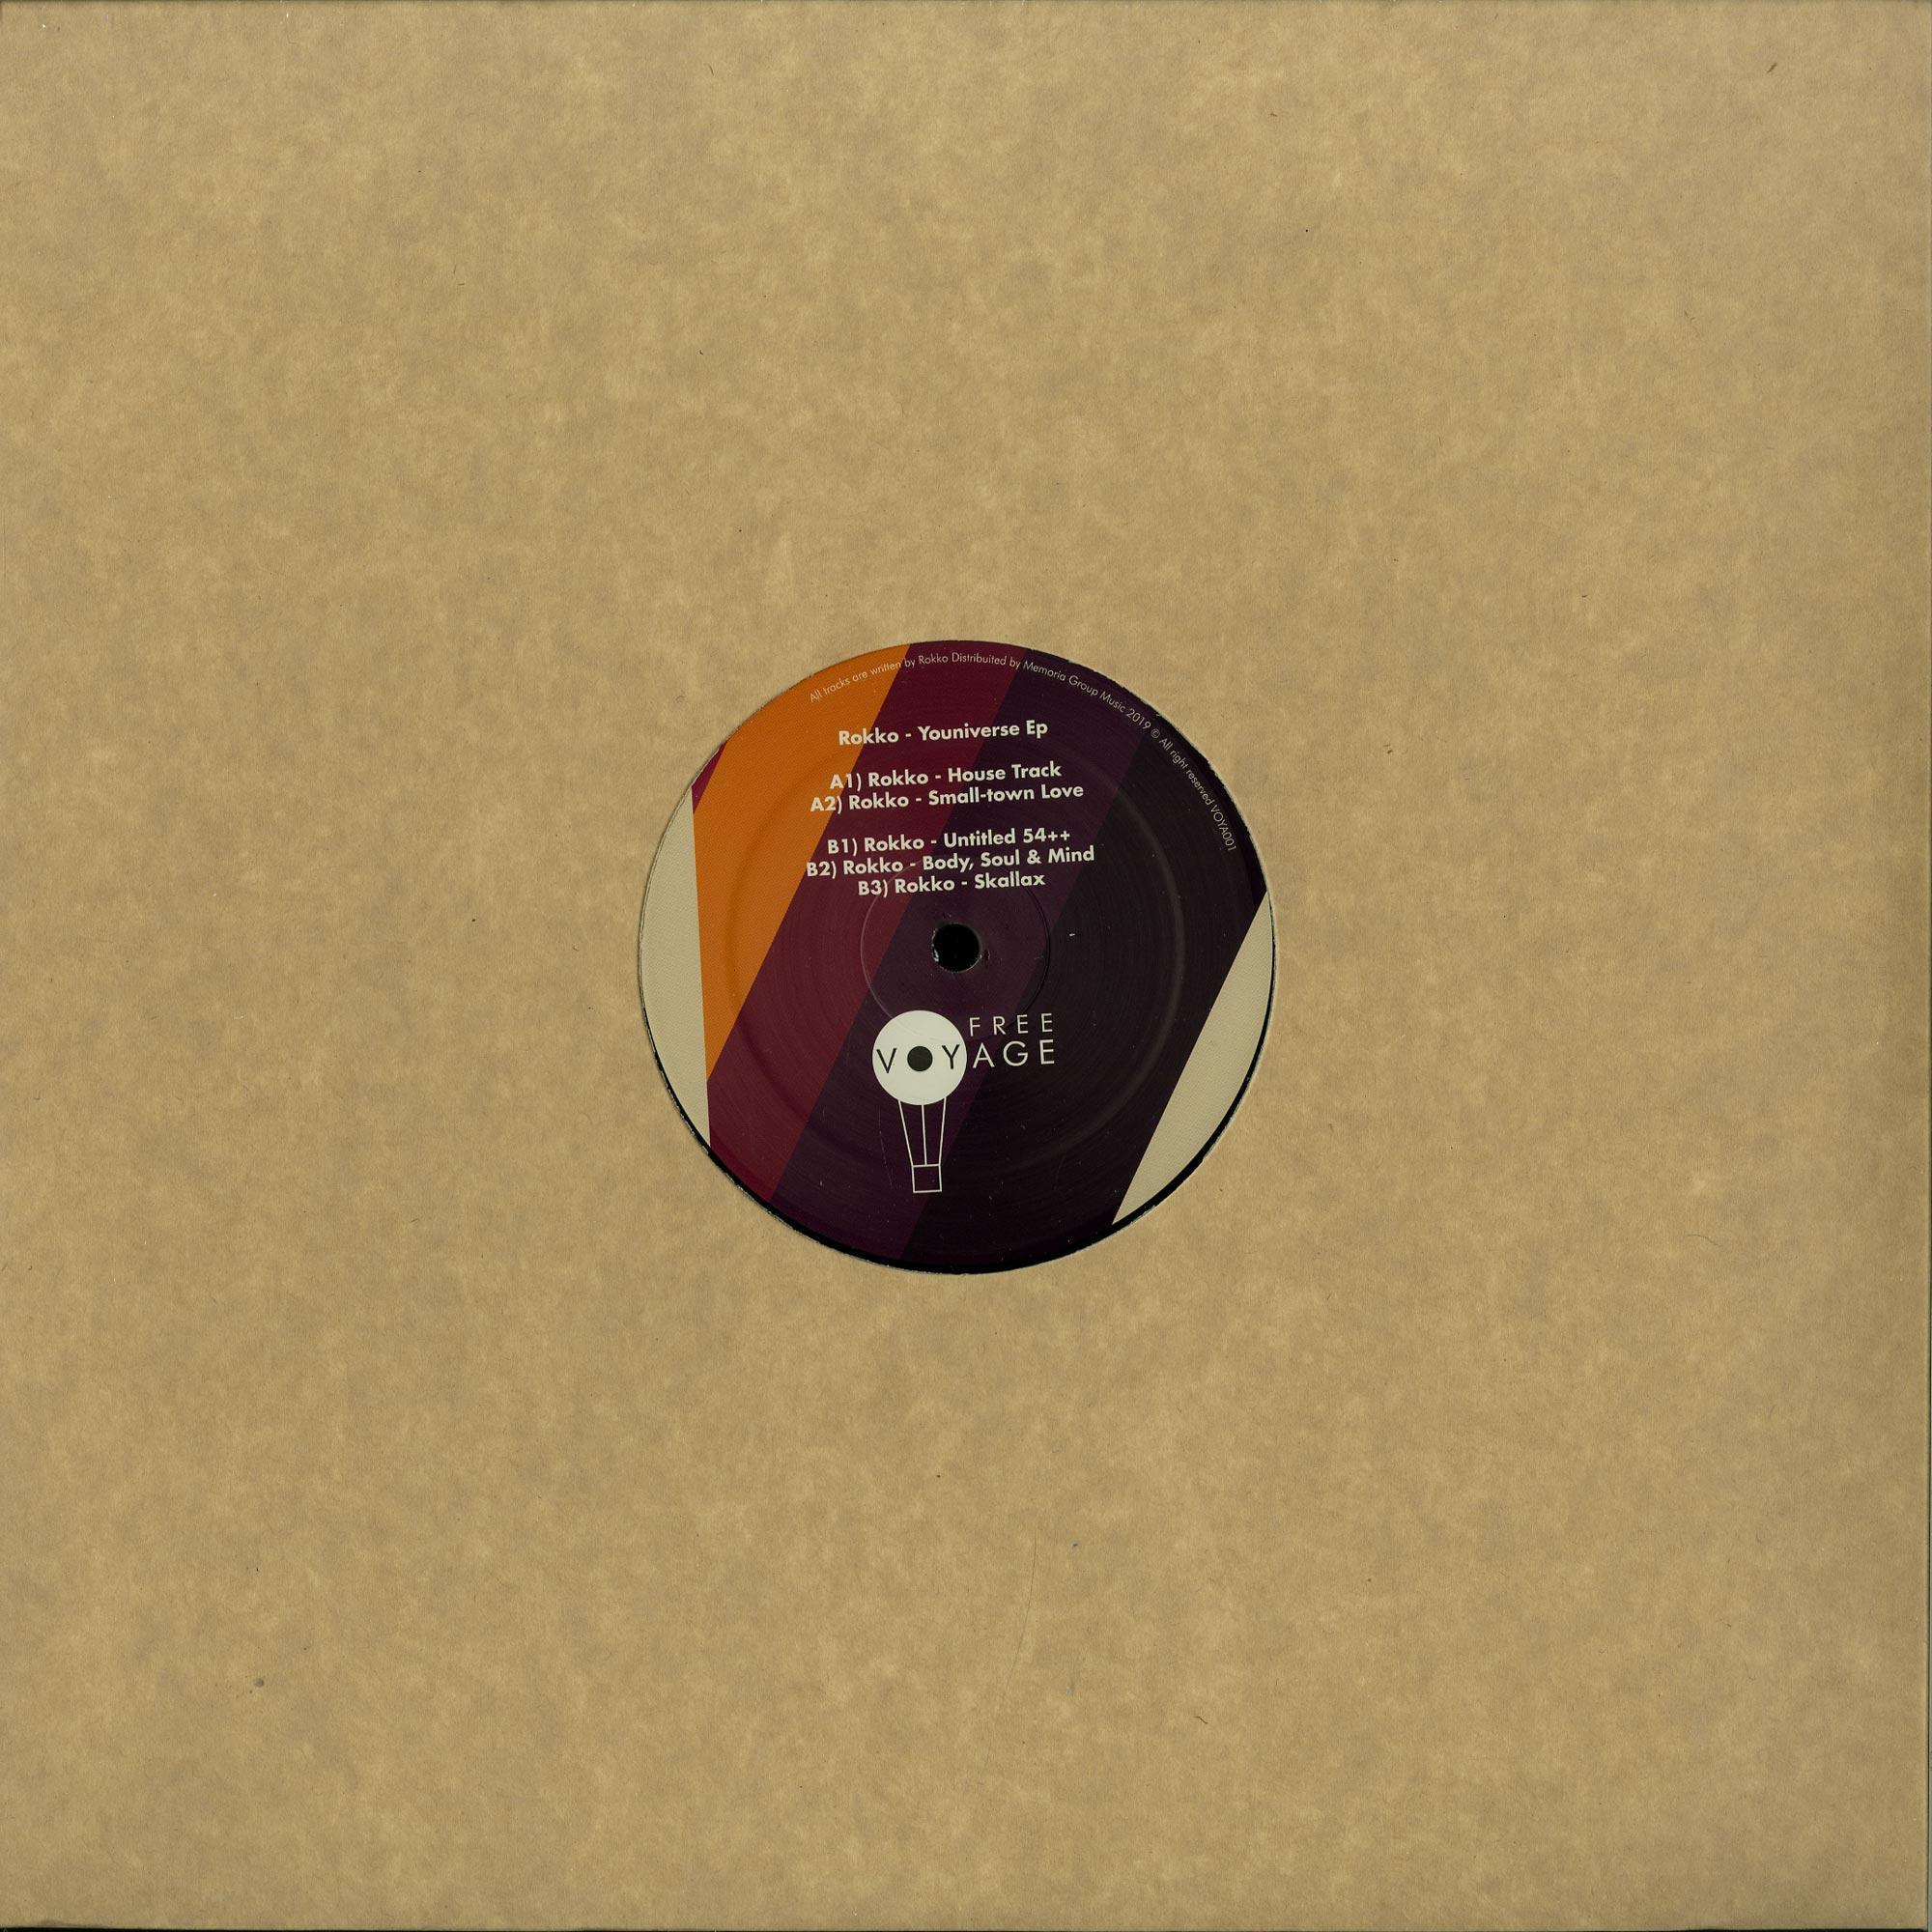 Rokko - YOUNIVERSE EP